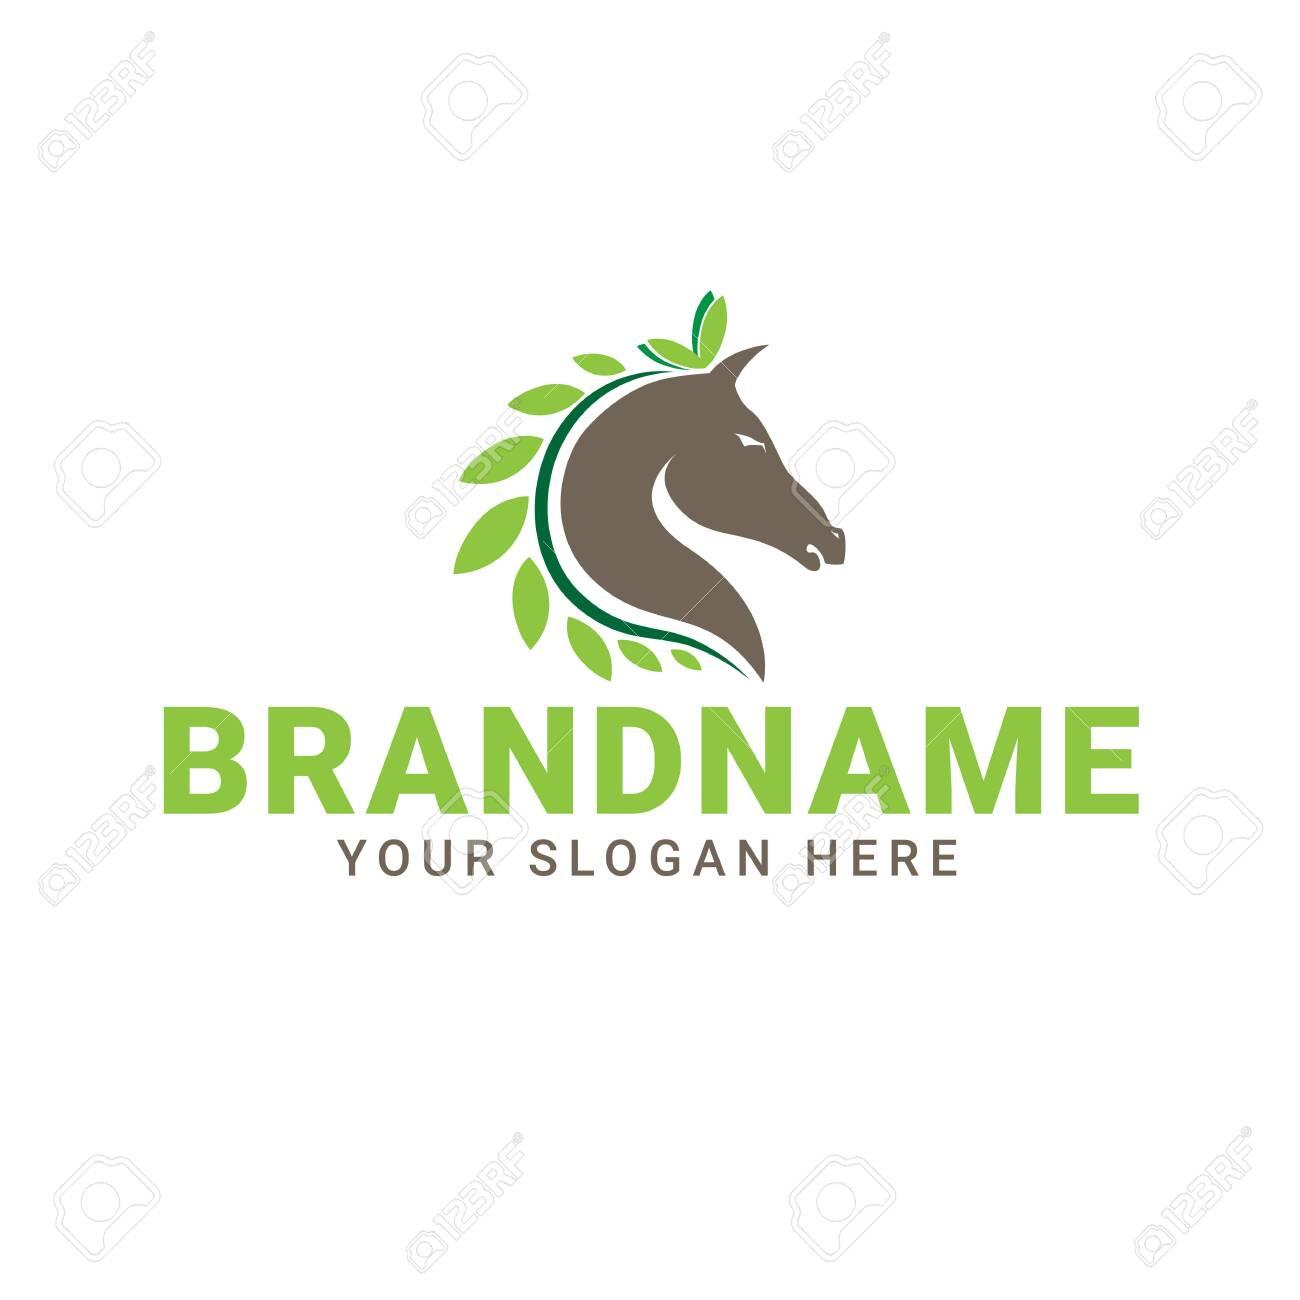 Creative Natural Horse Logo Design Vector Royalty Free Cliparts Vectors And Stock Illustration Image 150618023